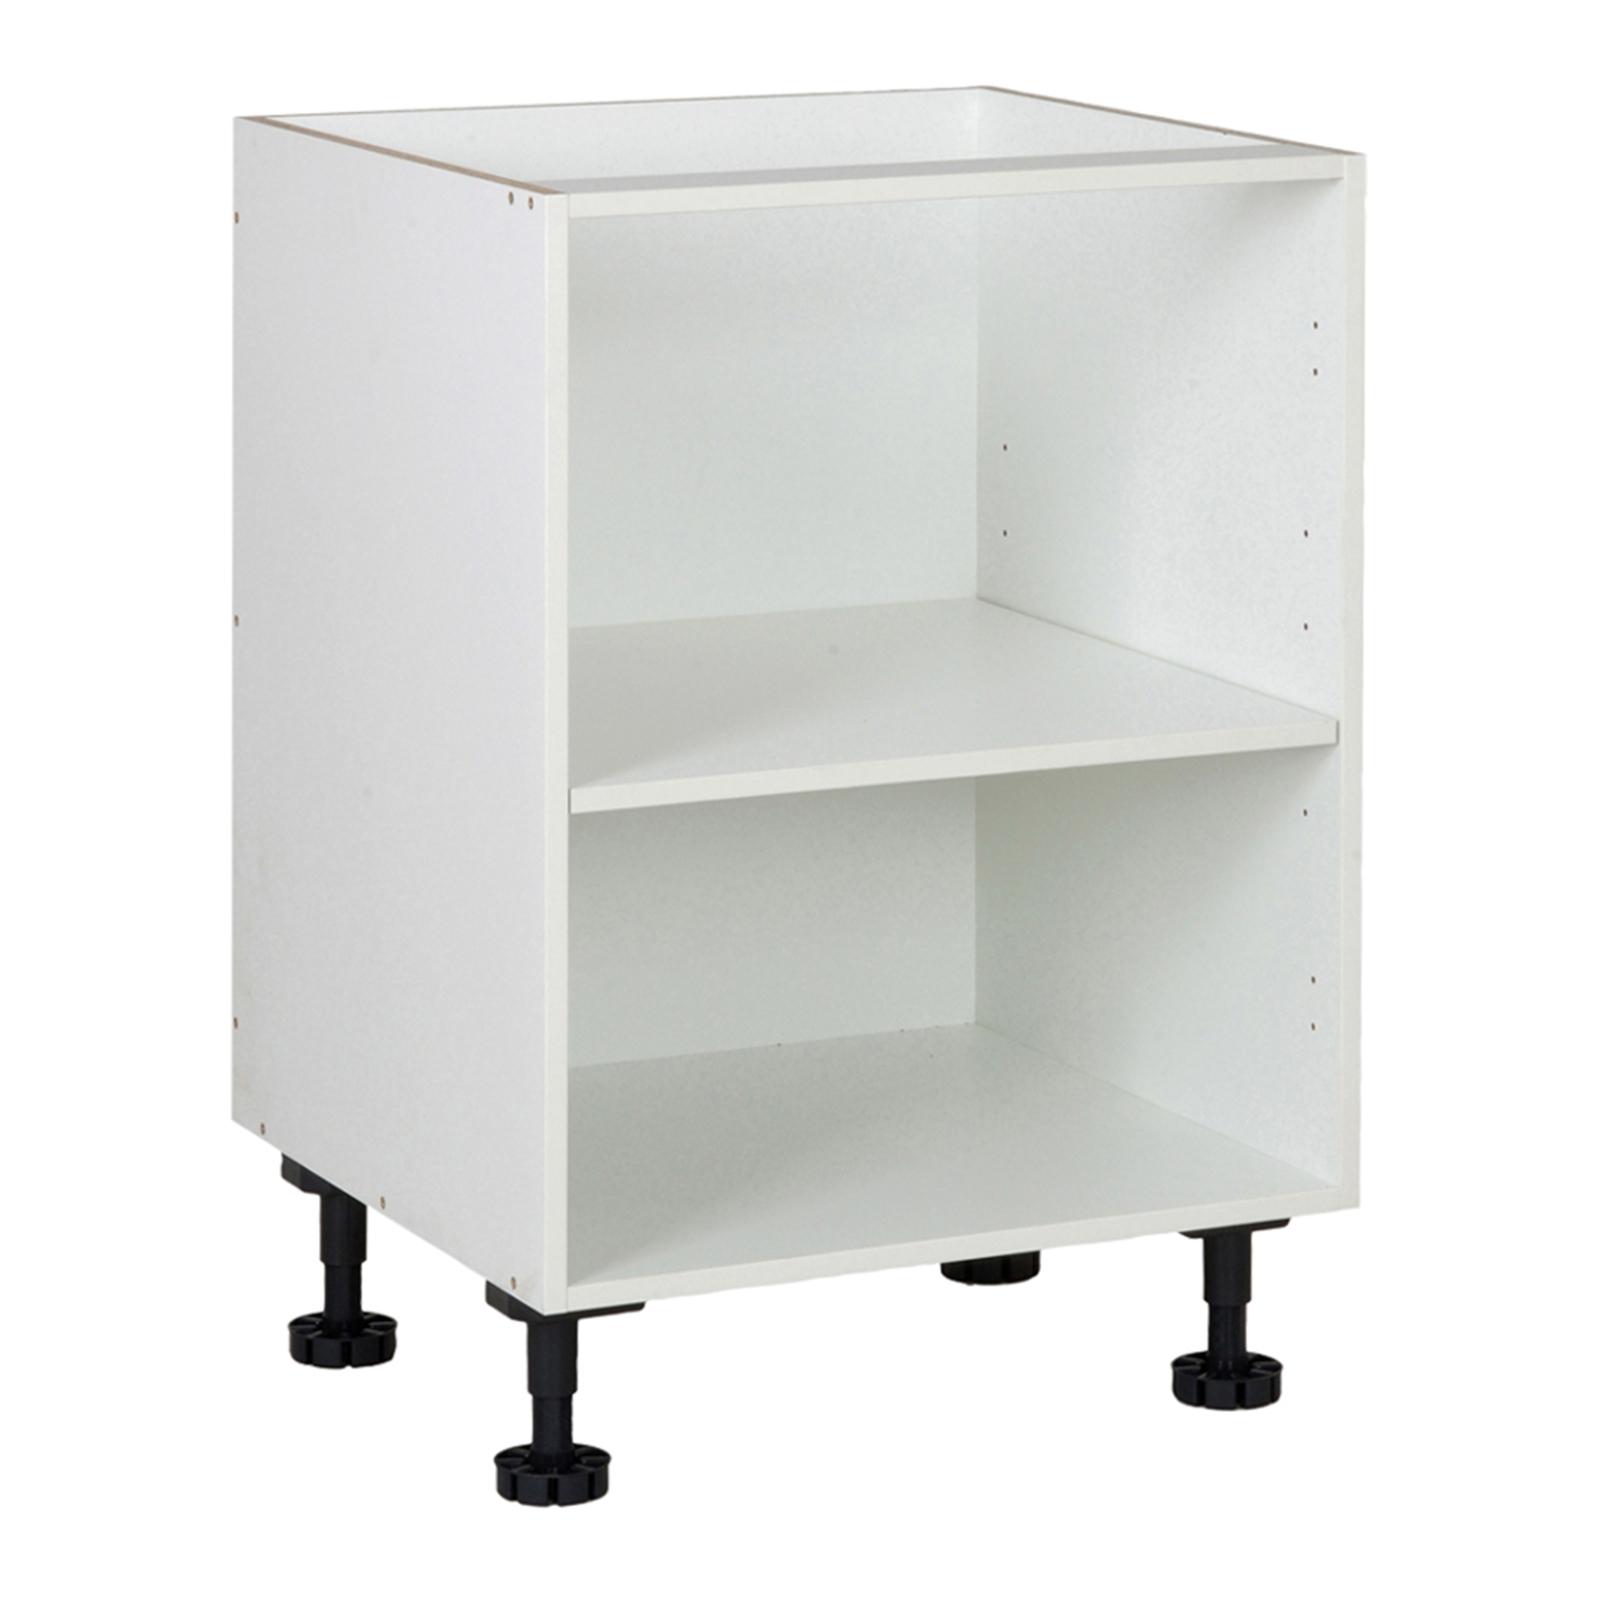 Kaboodle 600mm Base Cabinet